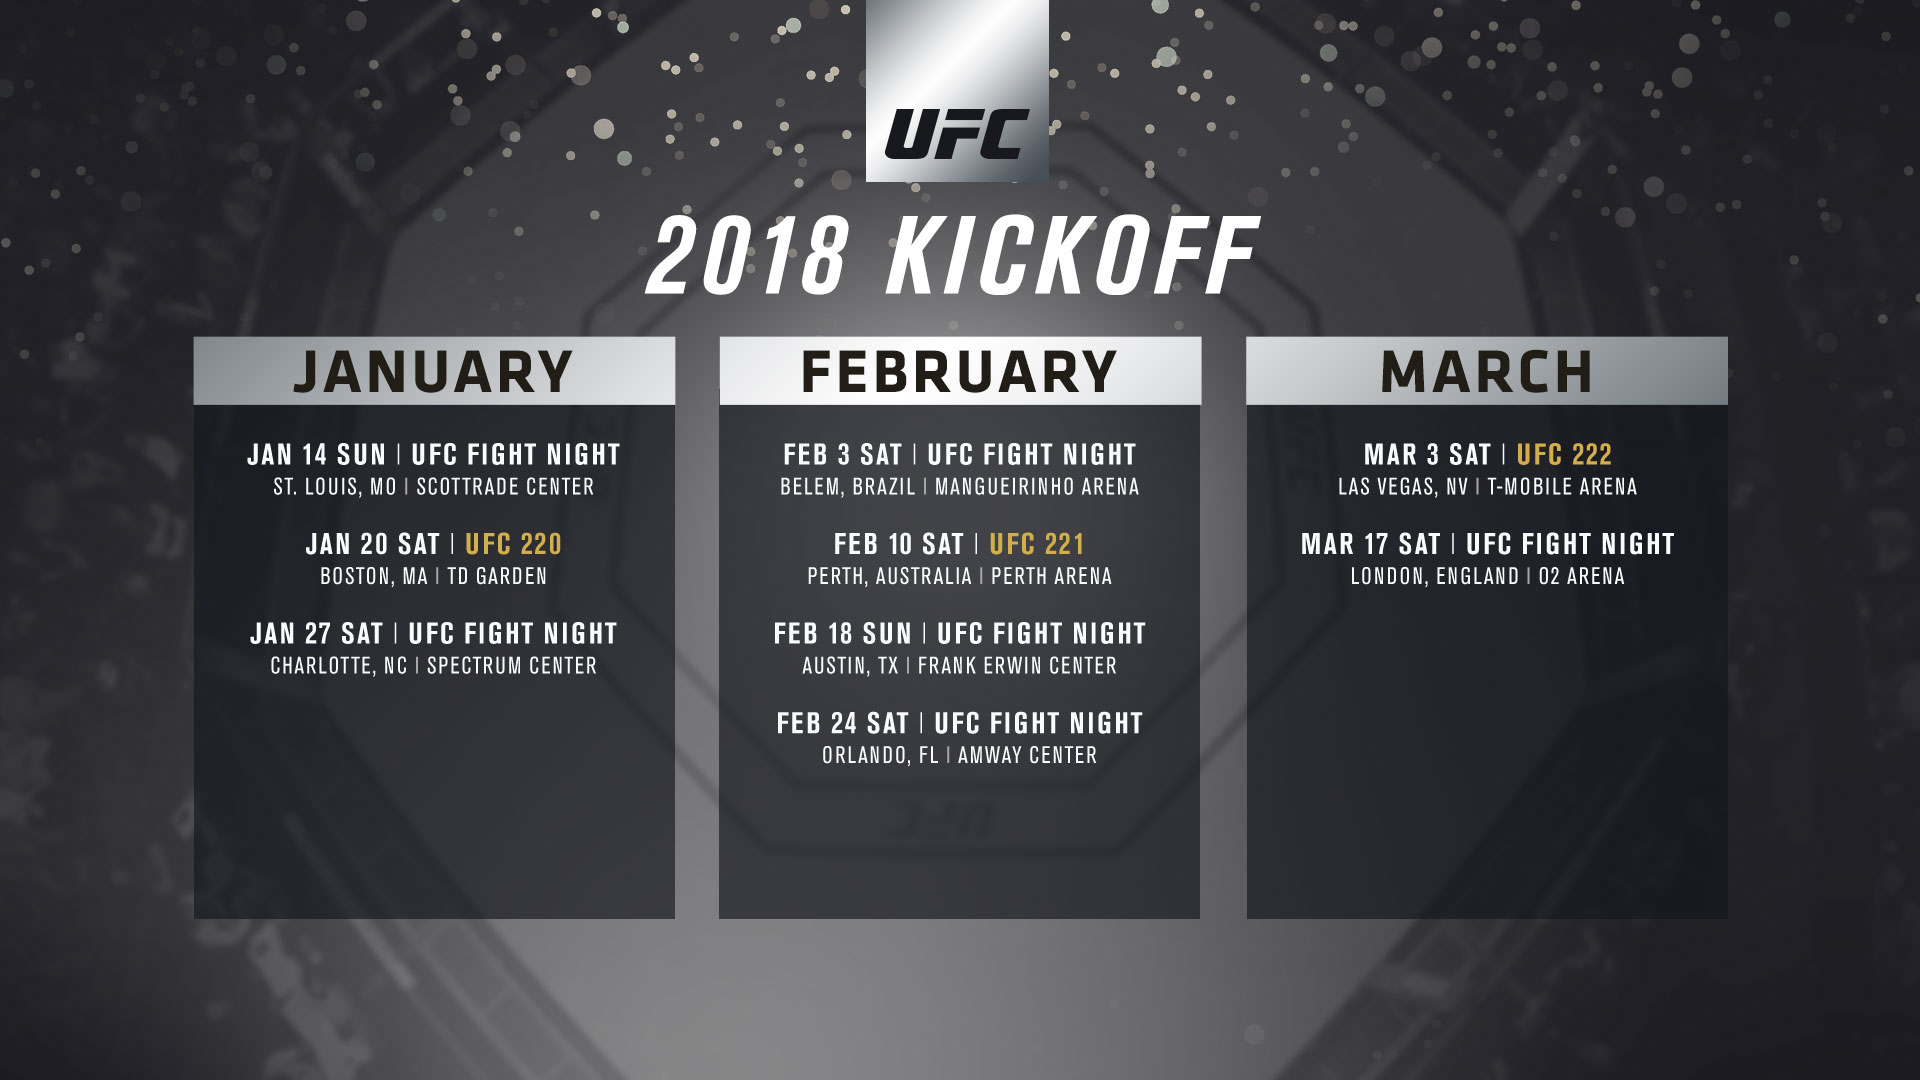 ufc announces q1 event schedule | ufc